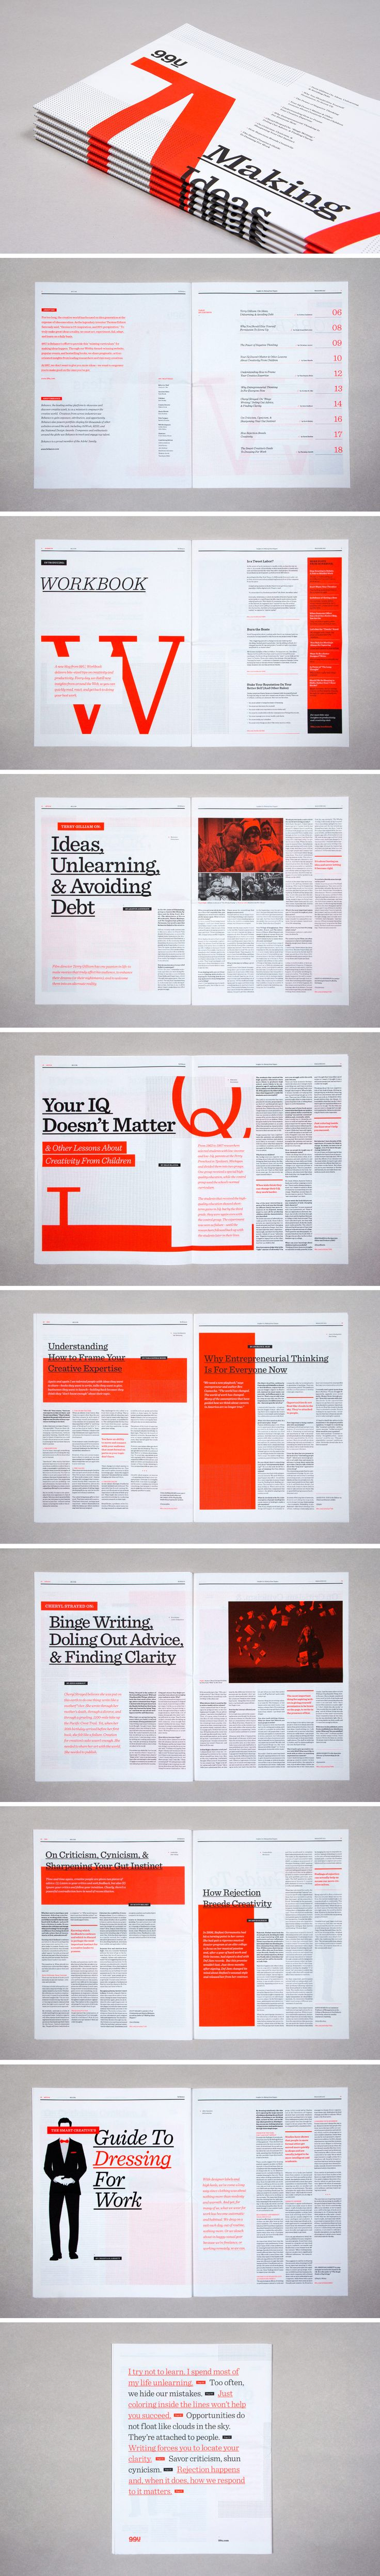 Editorial Design Inspiration: 99U #Magazine #print #design #editorial